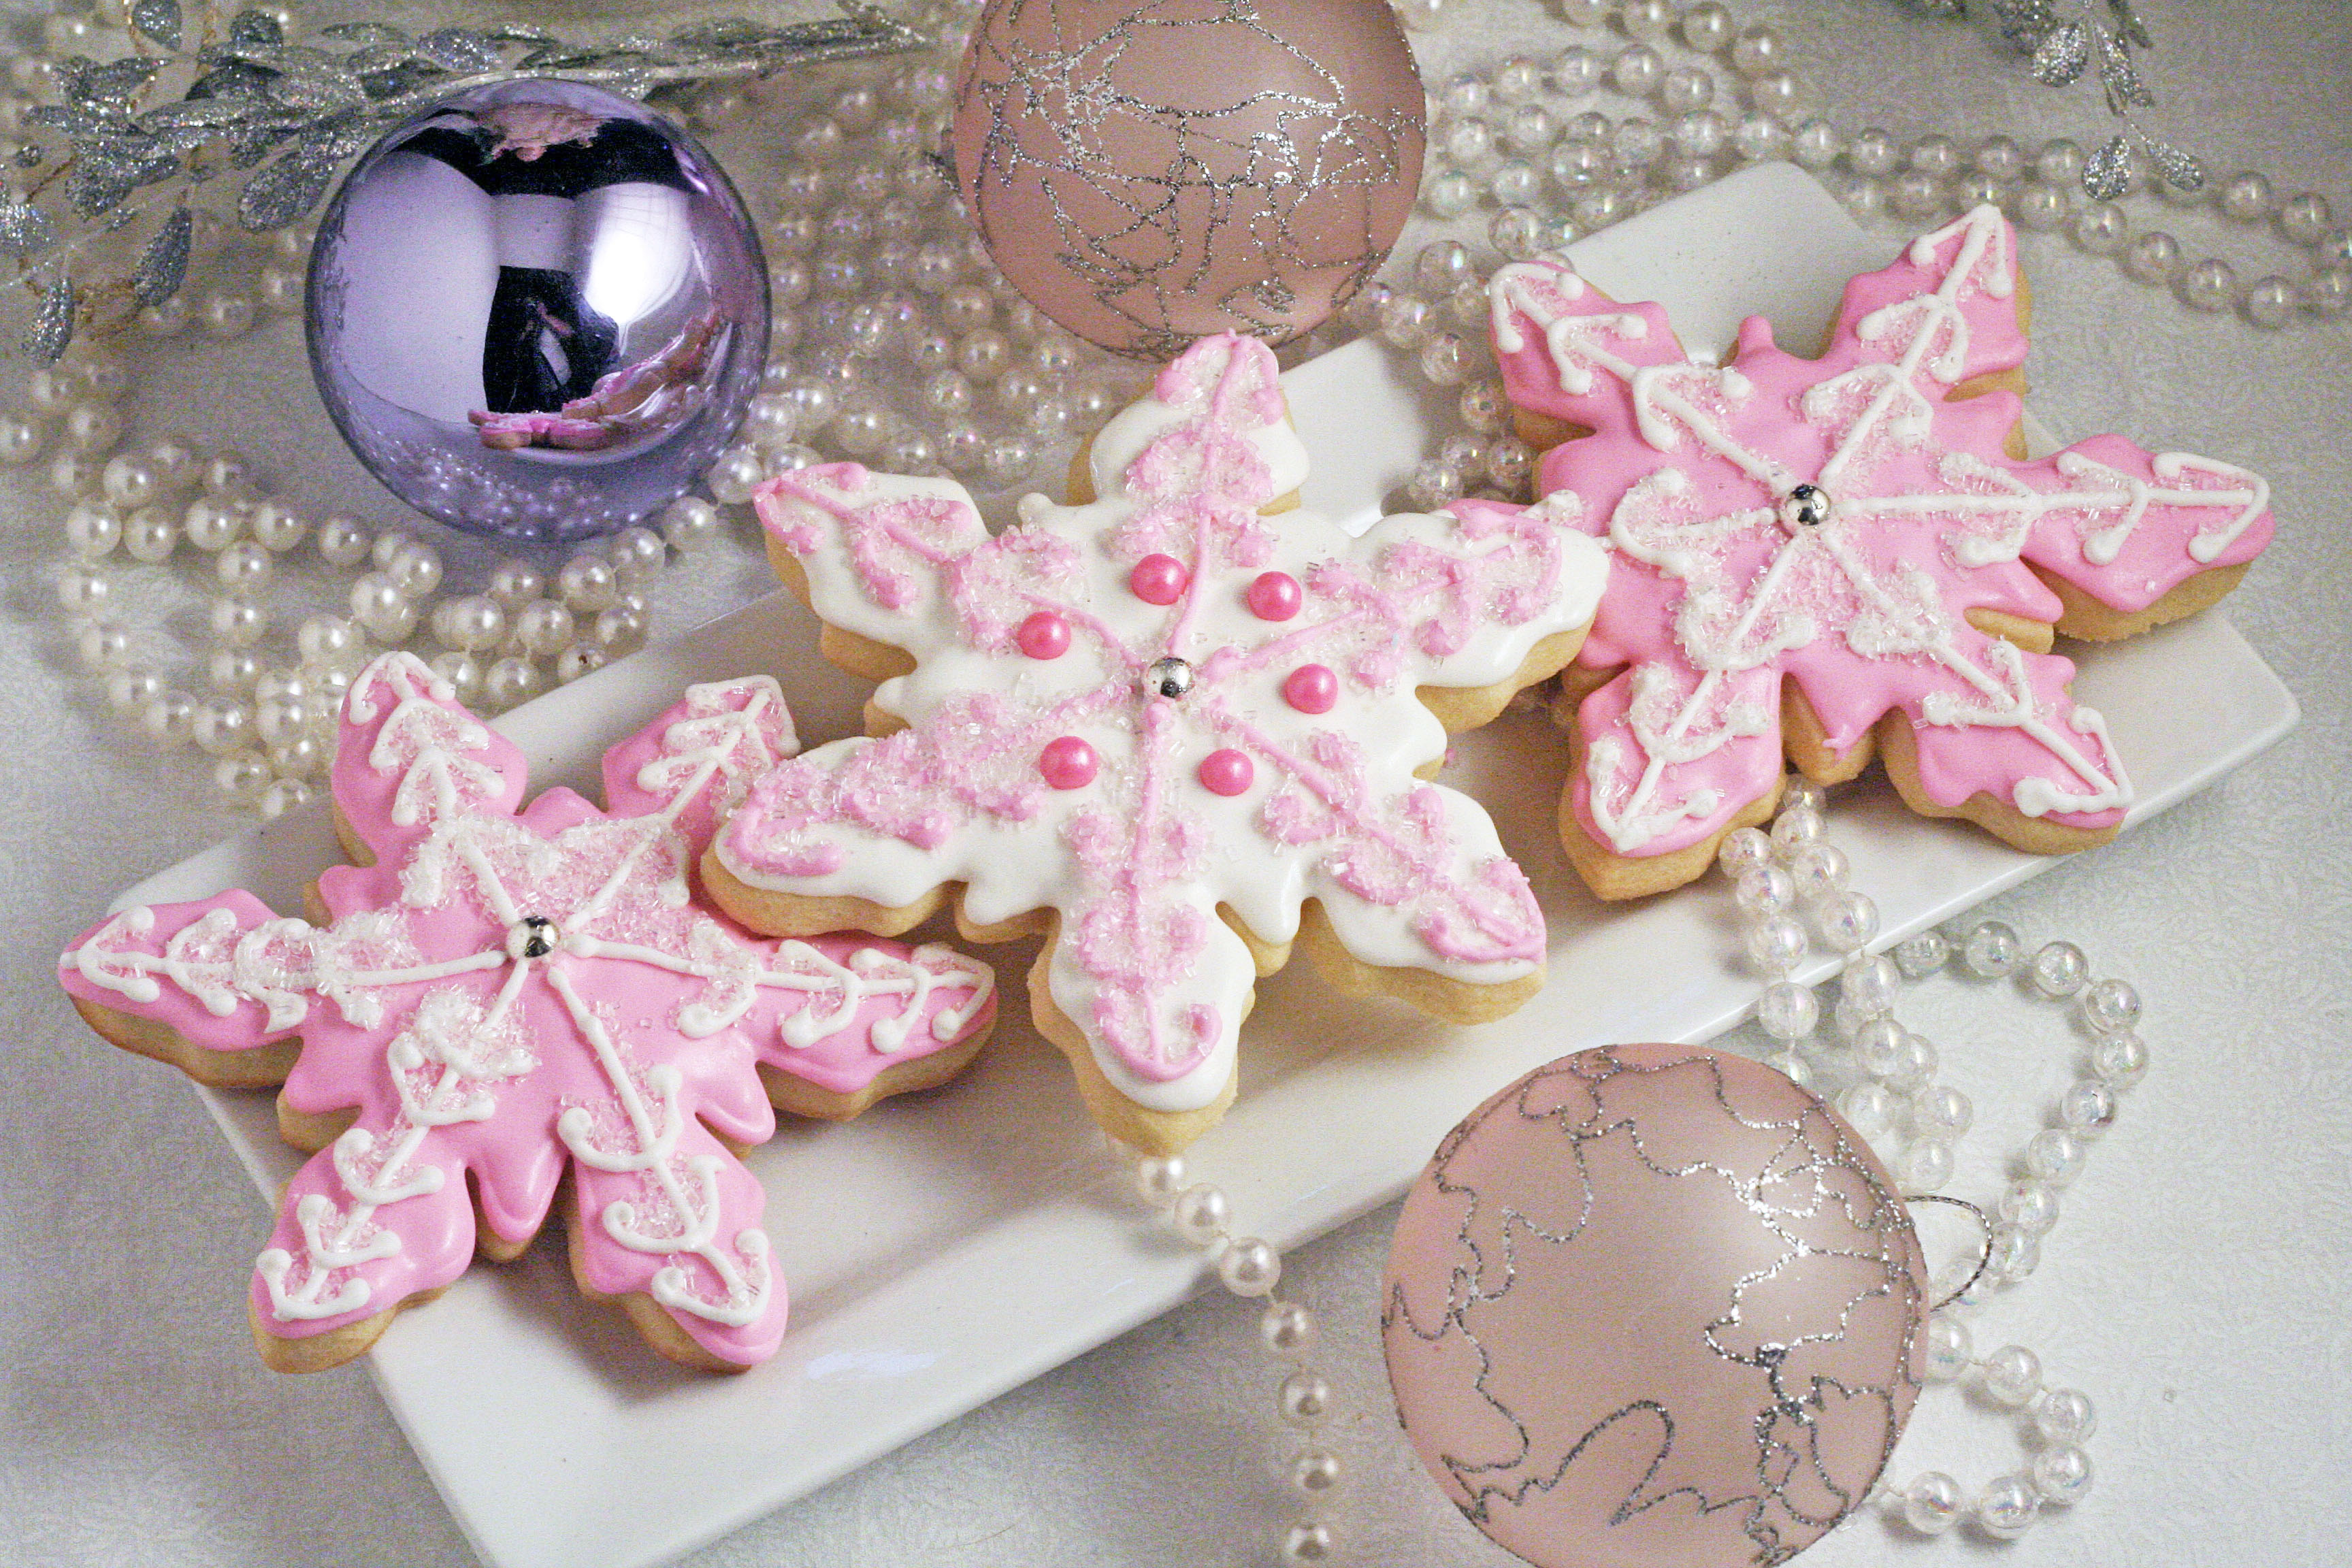 Cute Pink Snowman Wallpaper Sugar Cookie Pasta Princess And More